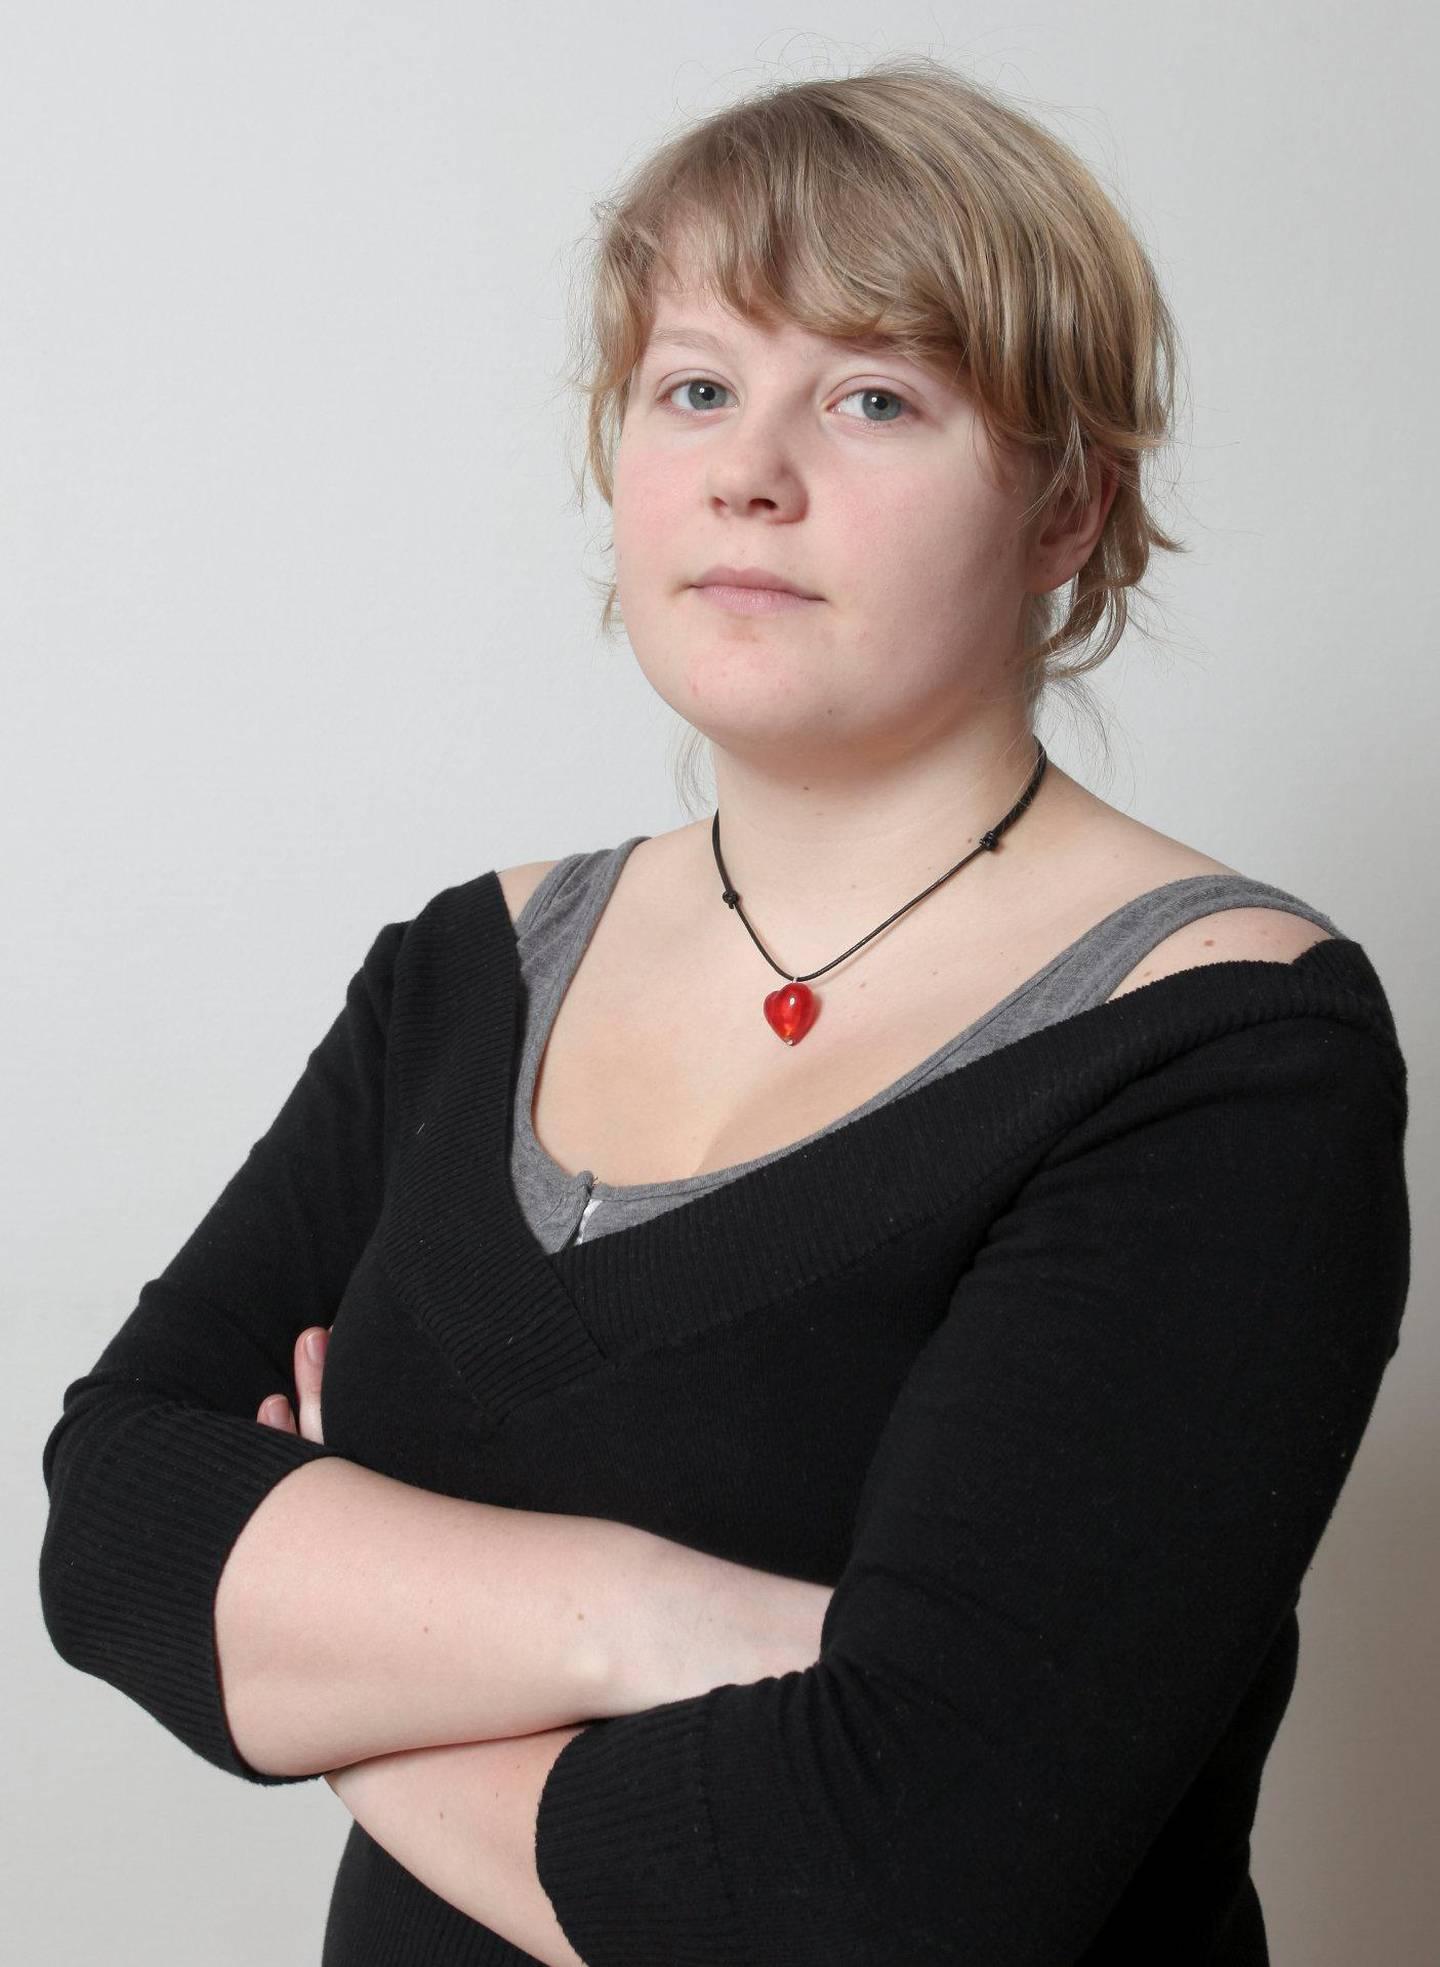 Lone Lunemann Jørgensen er leder i NTL Ung.